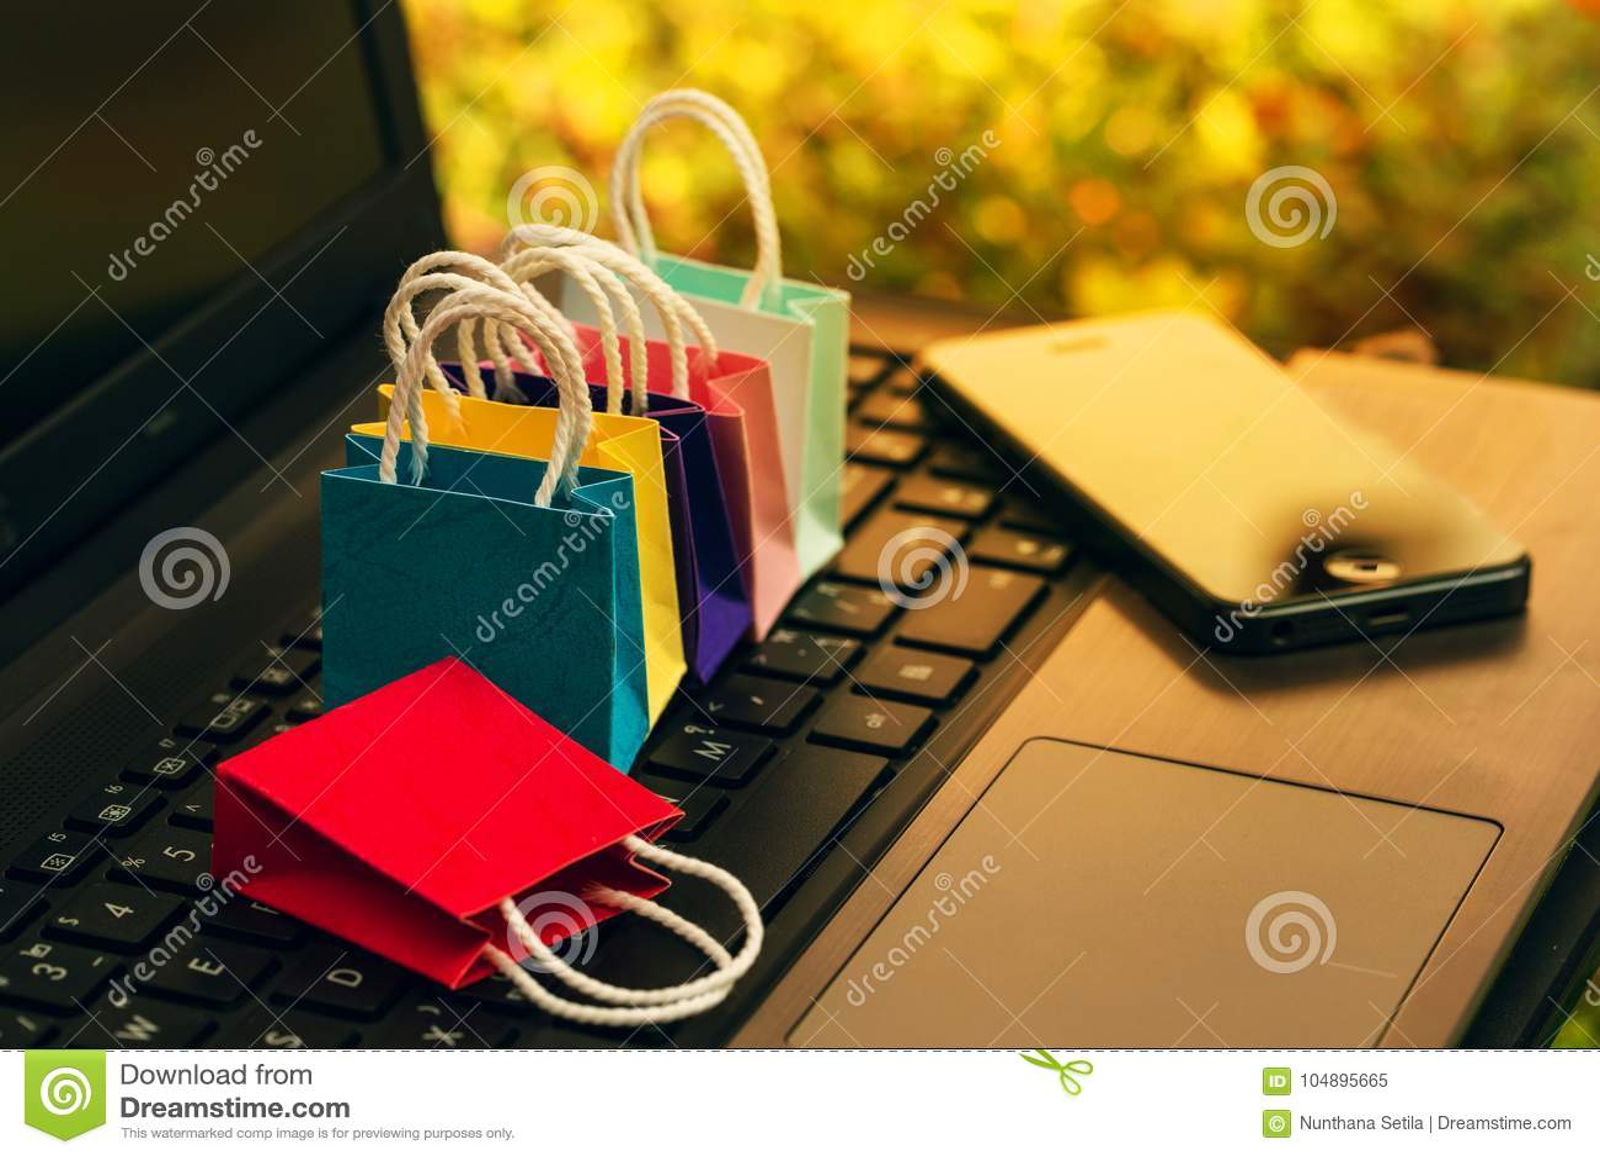 542a1e94fd Πέντε τσάντες αγορών εγγράφου με το κινητό τηλέφωνο σε ένα πληκτρολόγιο  lap-top Ιδέες για on-line να ψωνίσει ή να ψωνίσει στο σπίτι ή το γραφείο  που οι ...